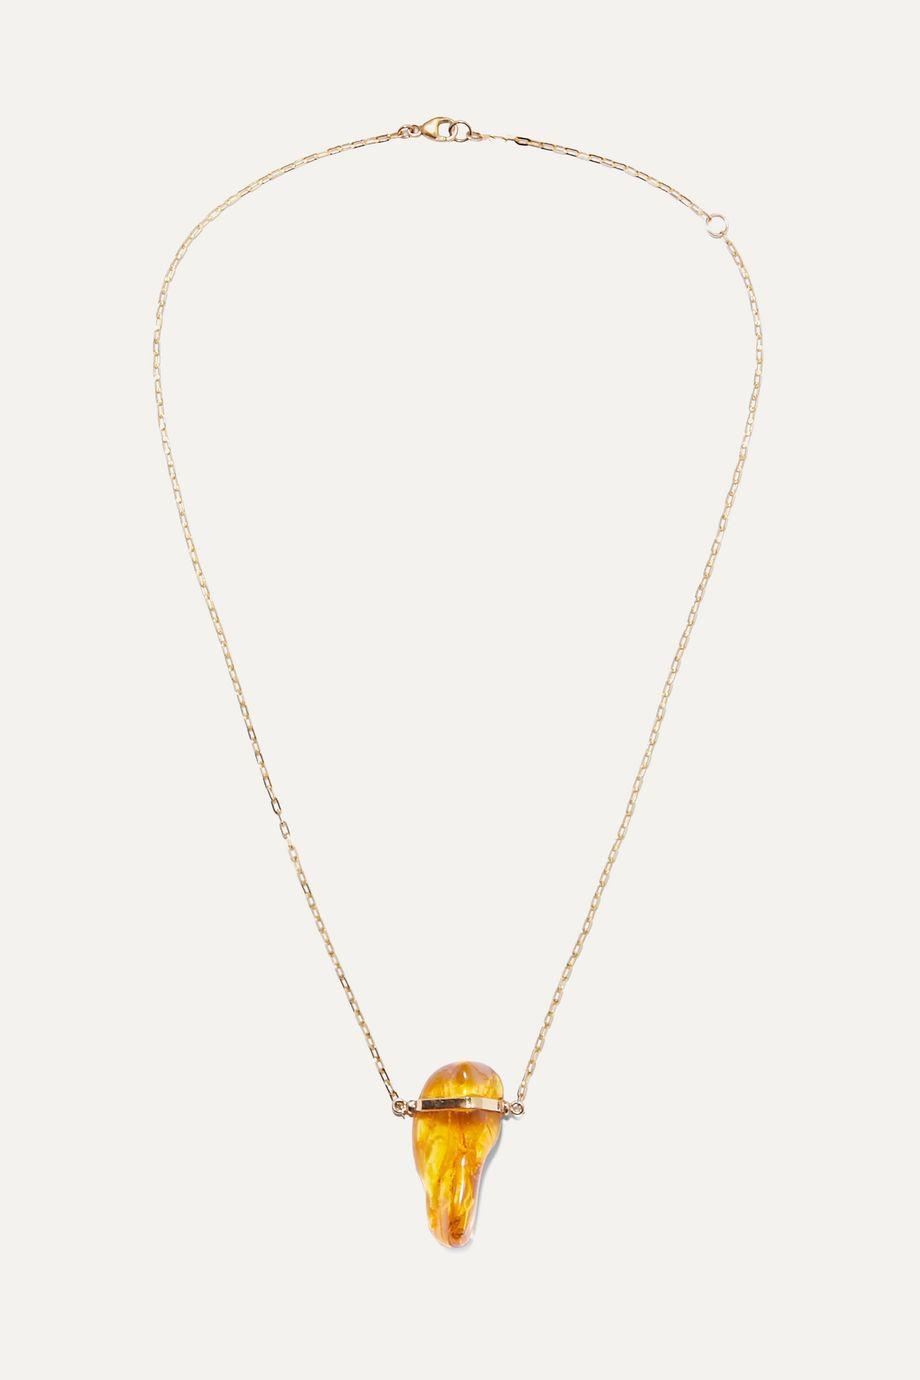 Harris Zhu 14-karat gold amber necklace